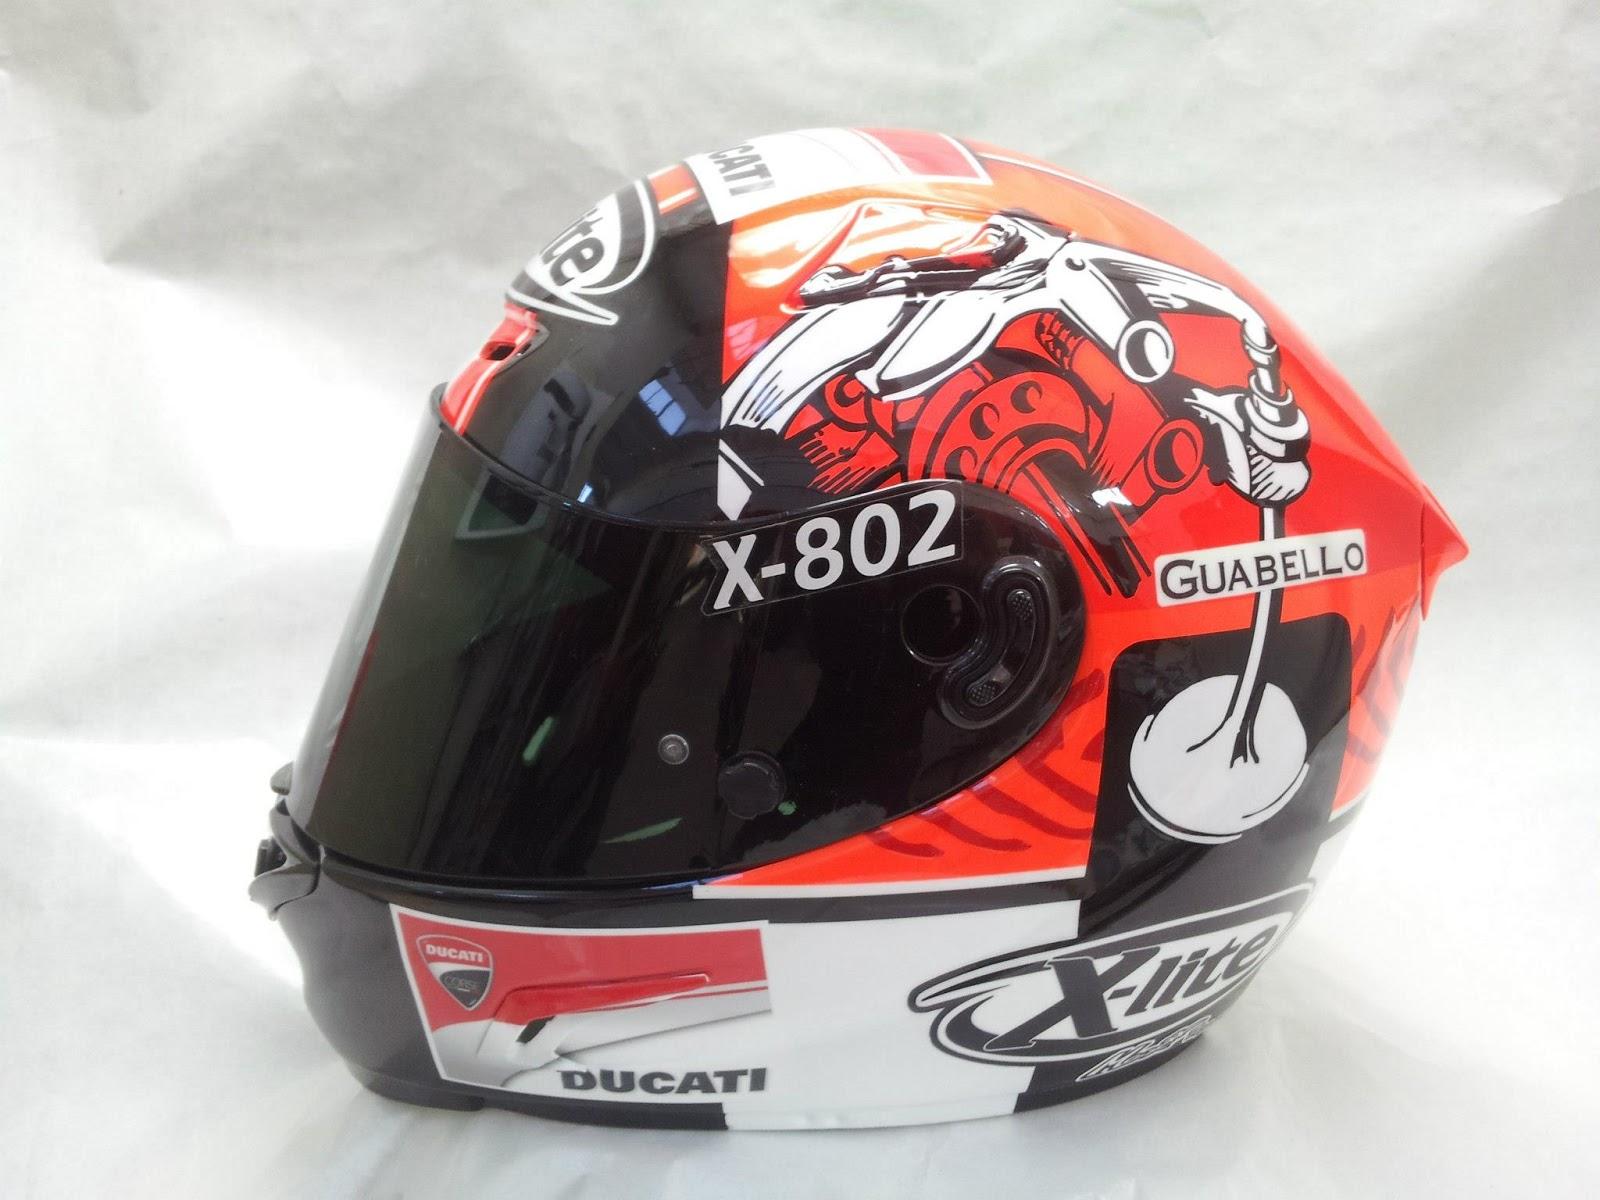 racing helmets garage x lite x 802r f battaini 2013 by. Black Bedroom Furniture Sets. Home Design Ideas